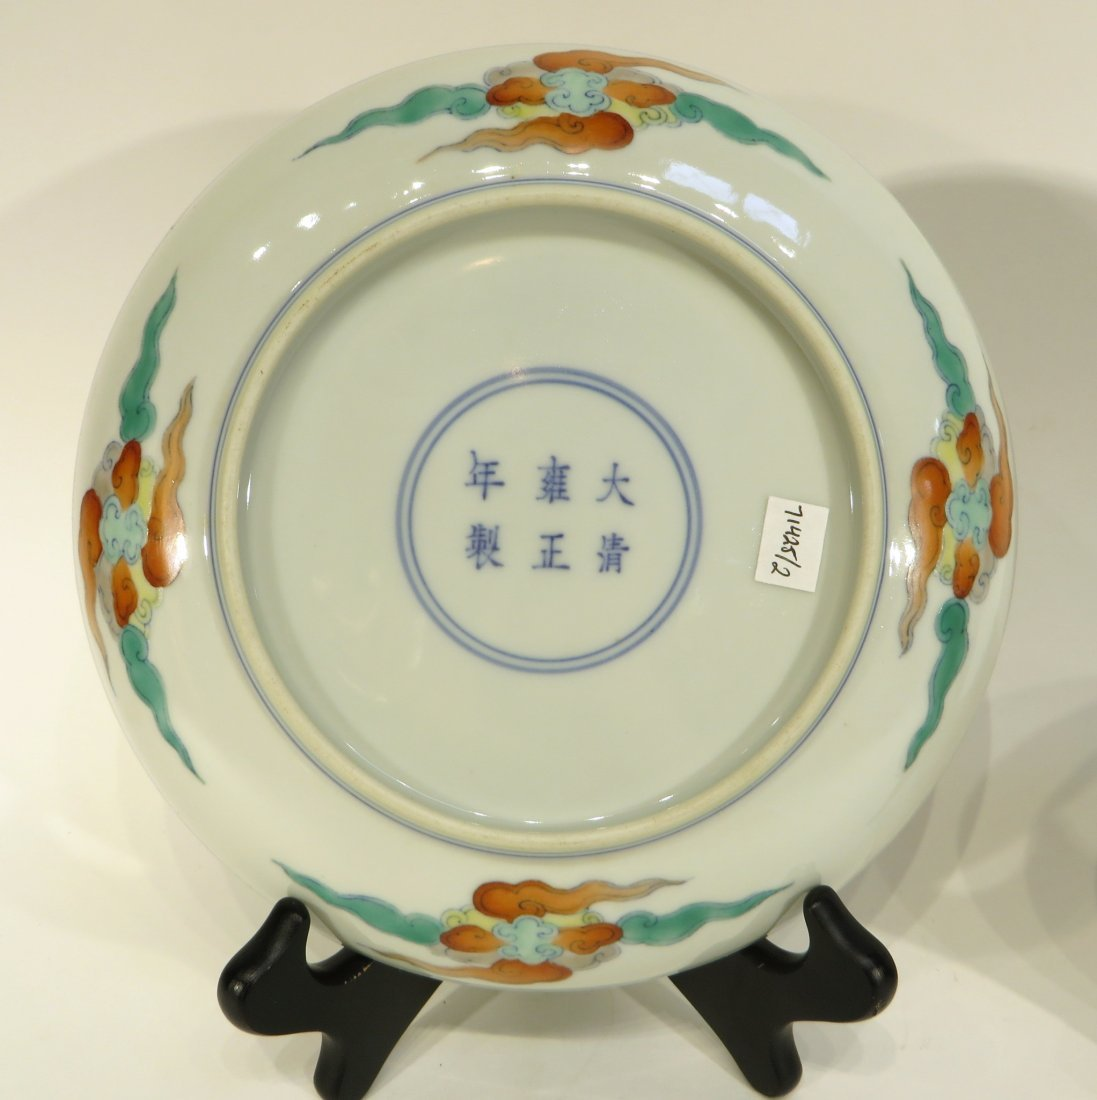 PAIR OF YONG ZHENG PLATES IN ORIGINAL BOX - 6